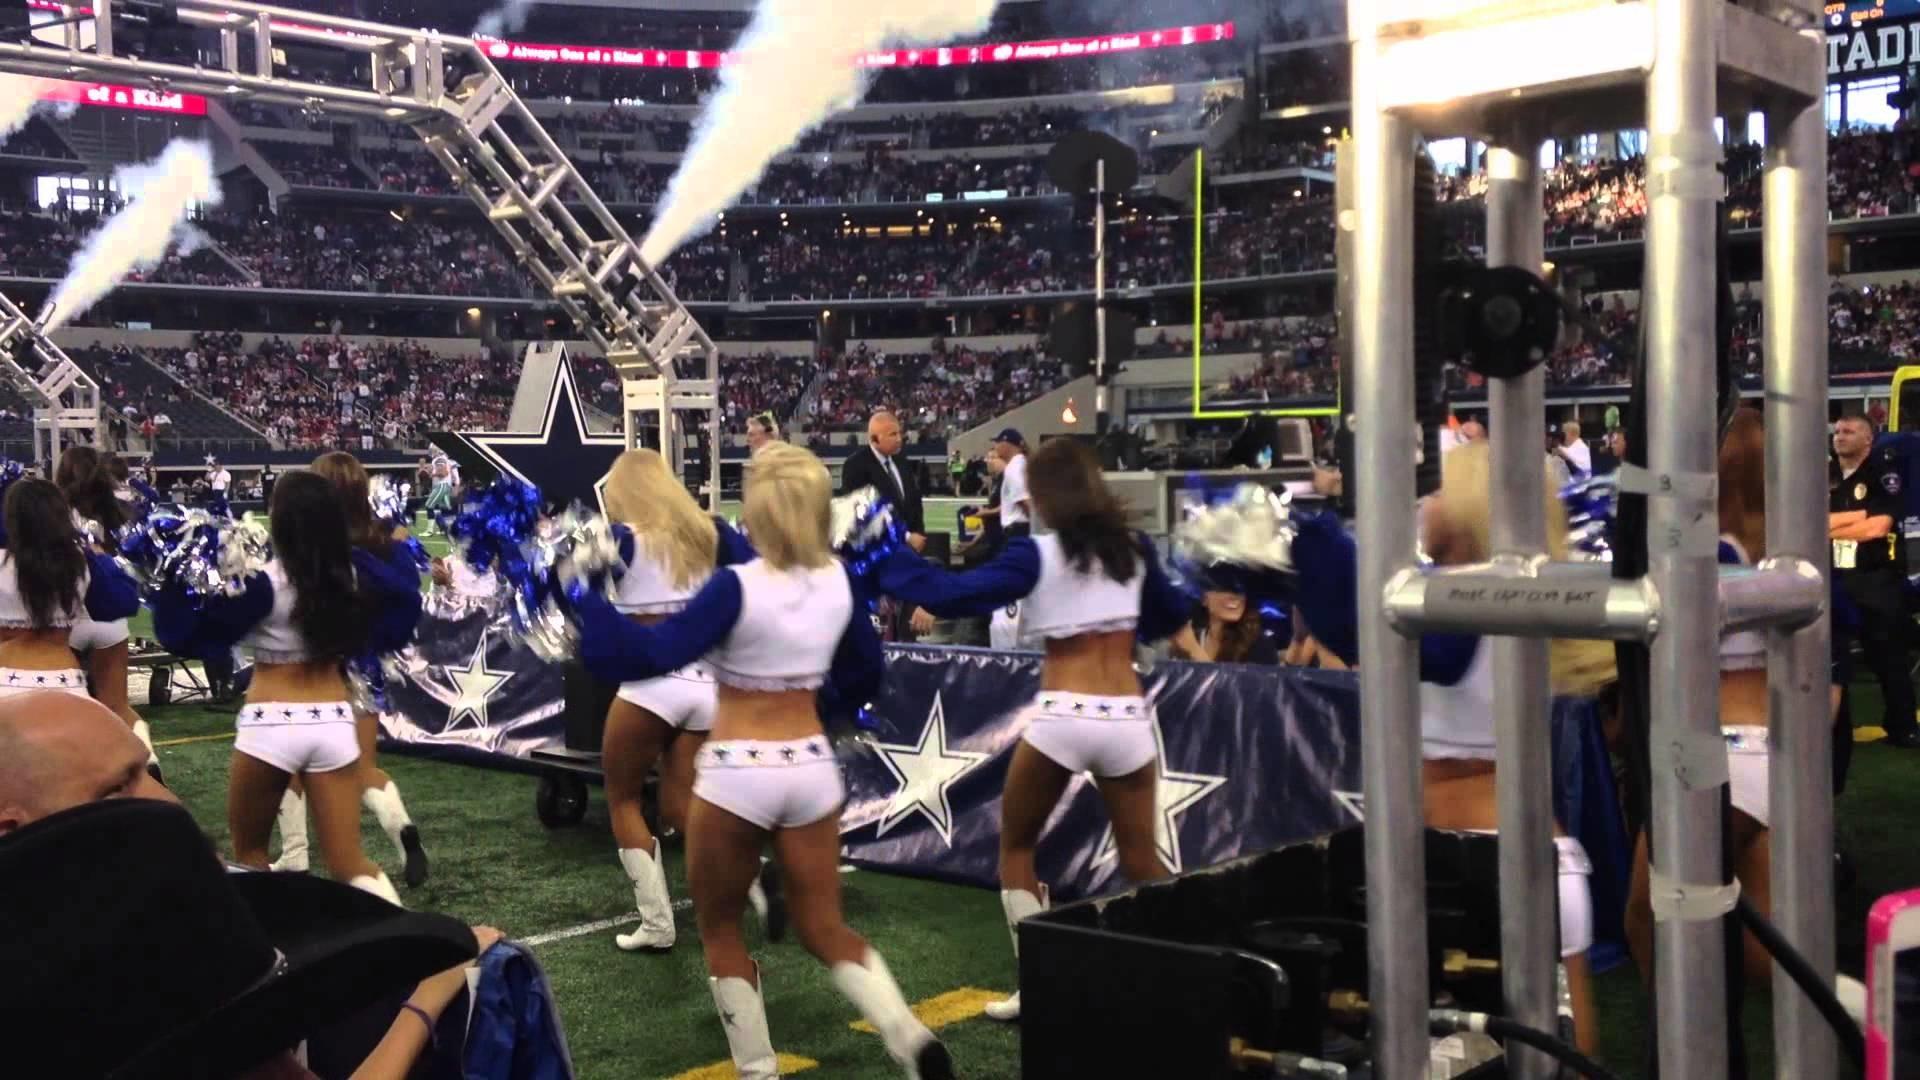 Dallas Cowboys & Cheerleaders Entrance 2013 Preseason Game Cowboys vs  Houston Texans – YouTube